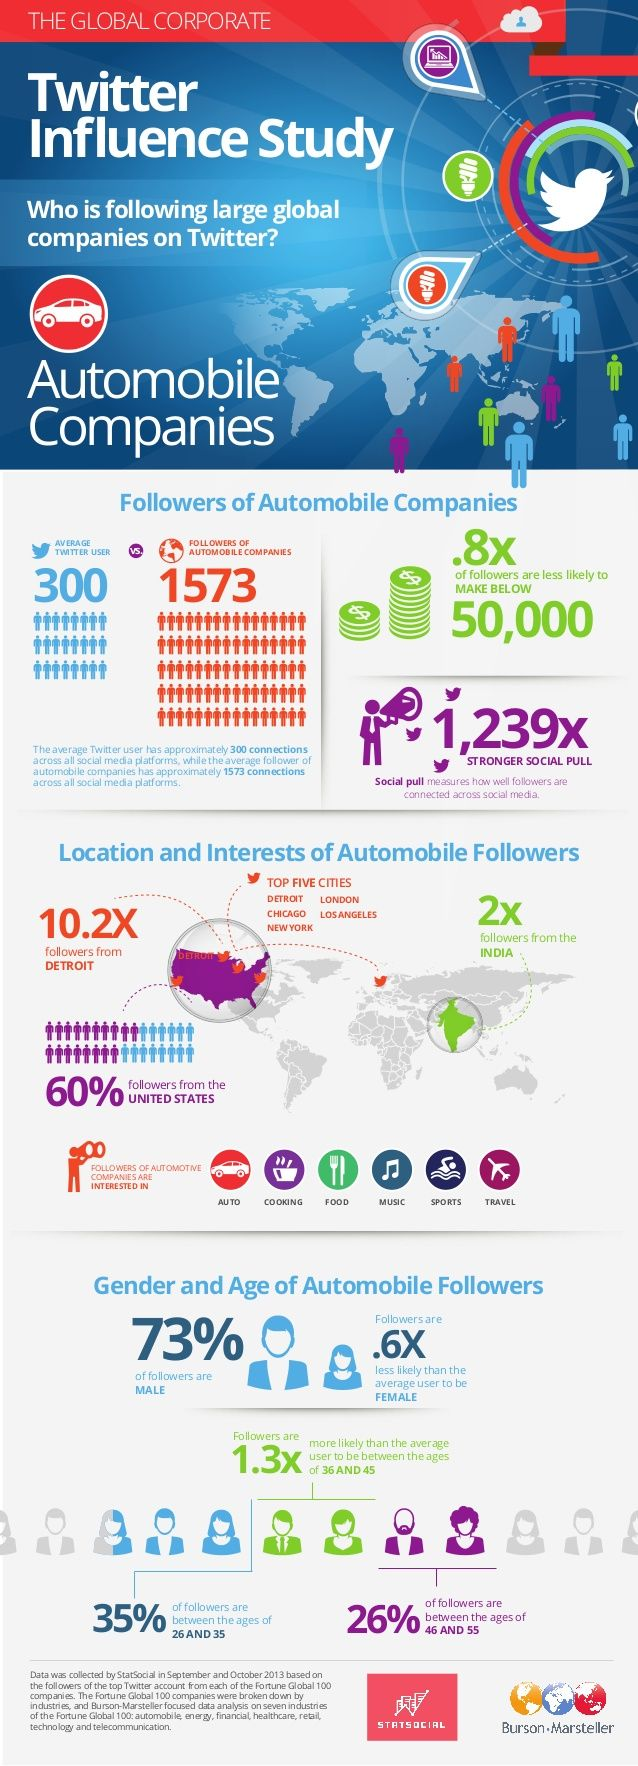 Burson-Marsteller Global Corporate Twitter Influence Study: Automobile Companies by Burson-Marsteller via slideshare